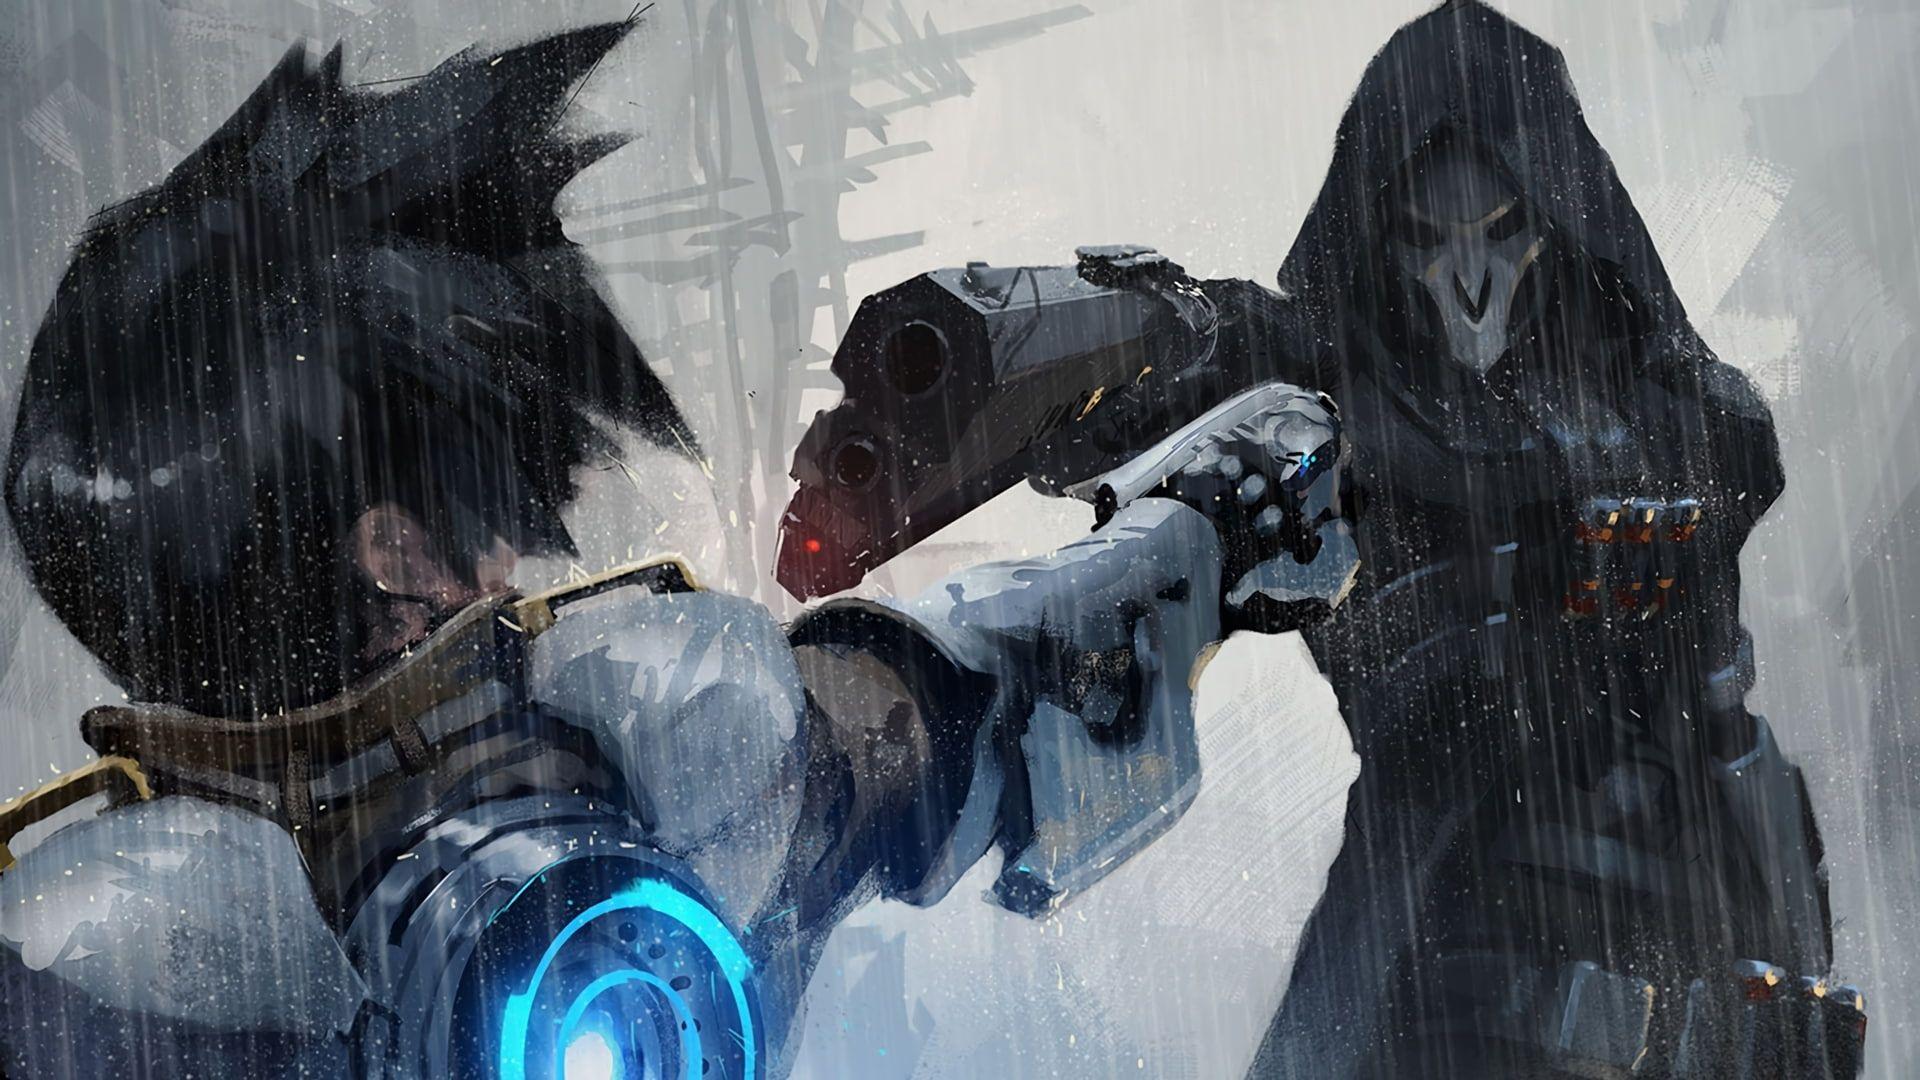 Overwatch Video Games Tracer Overwatch Reaper Overwatch Digital Art 1080p Wallpaper Hdwallpaper Overwatch Wallpapers Overwatch Reaper Overwatch Posters